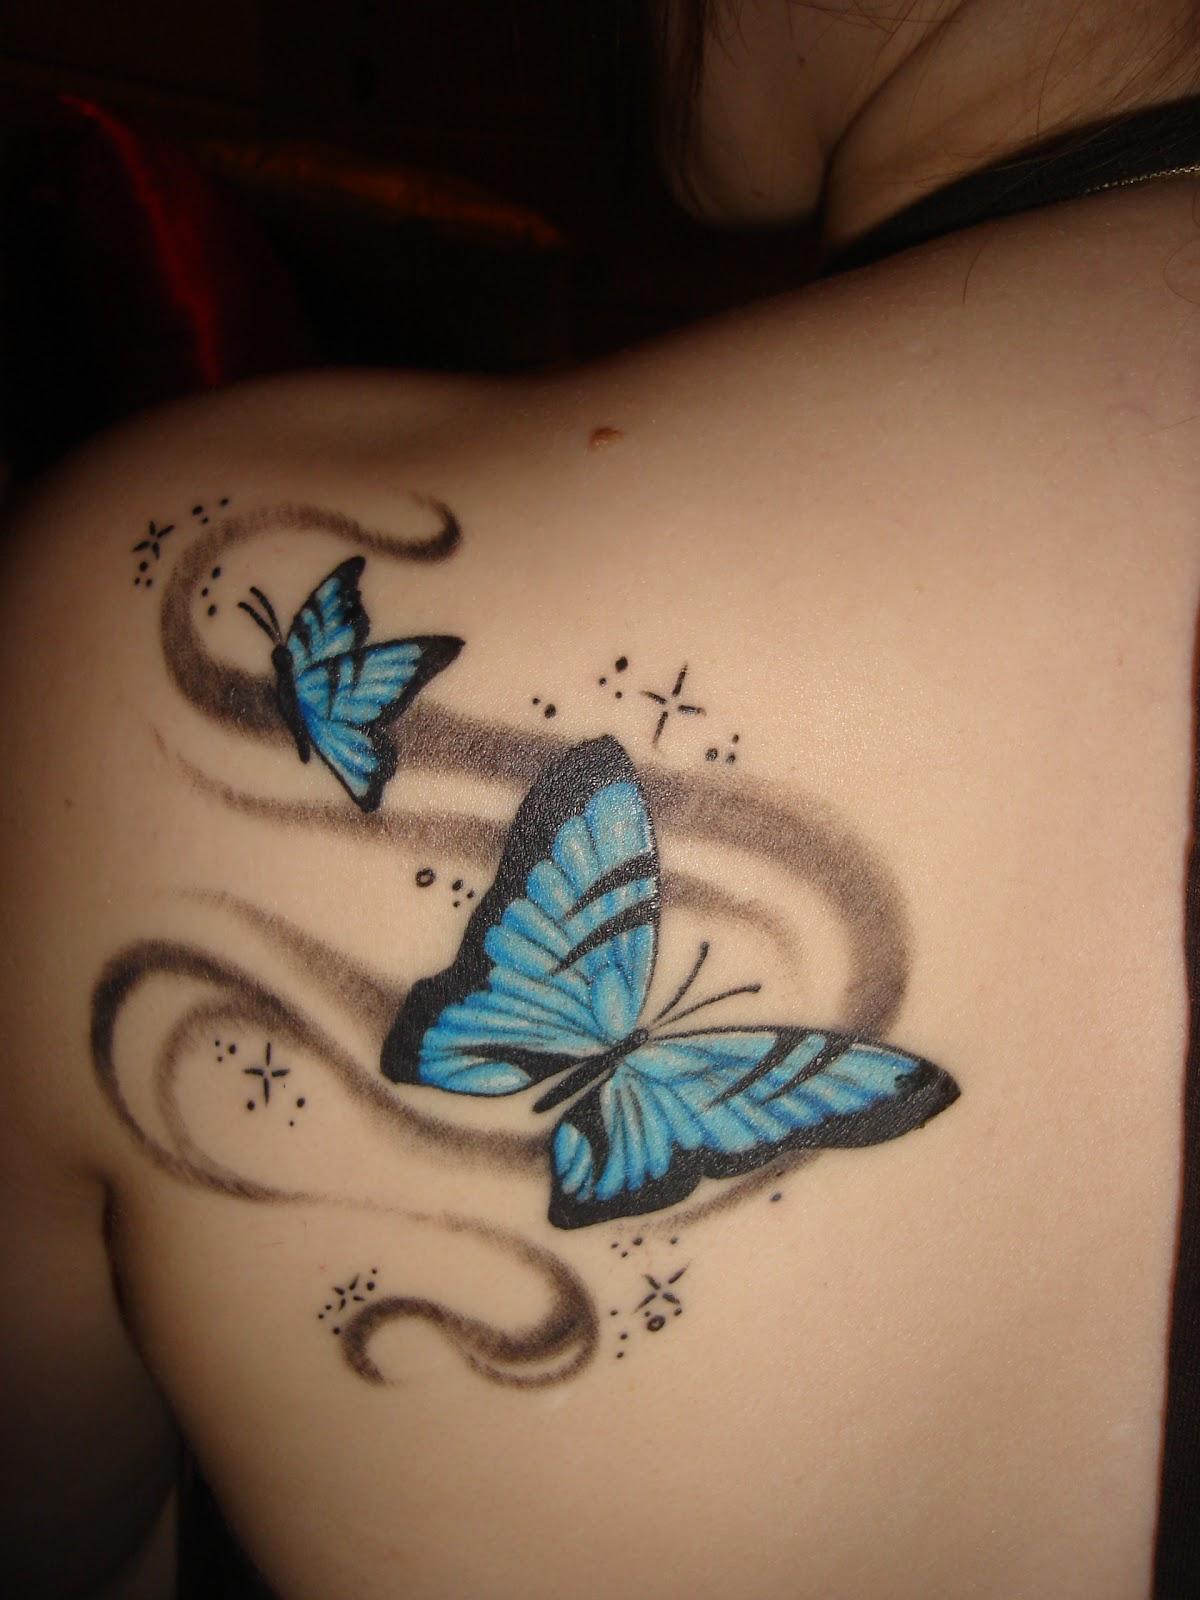 Cute Simple Acrylic Nail Designs: Unique Tattoos